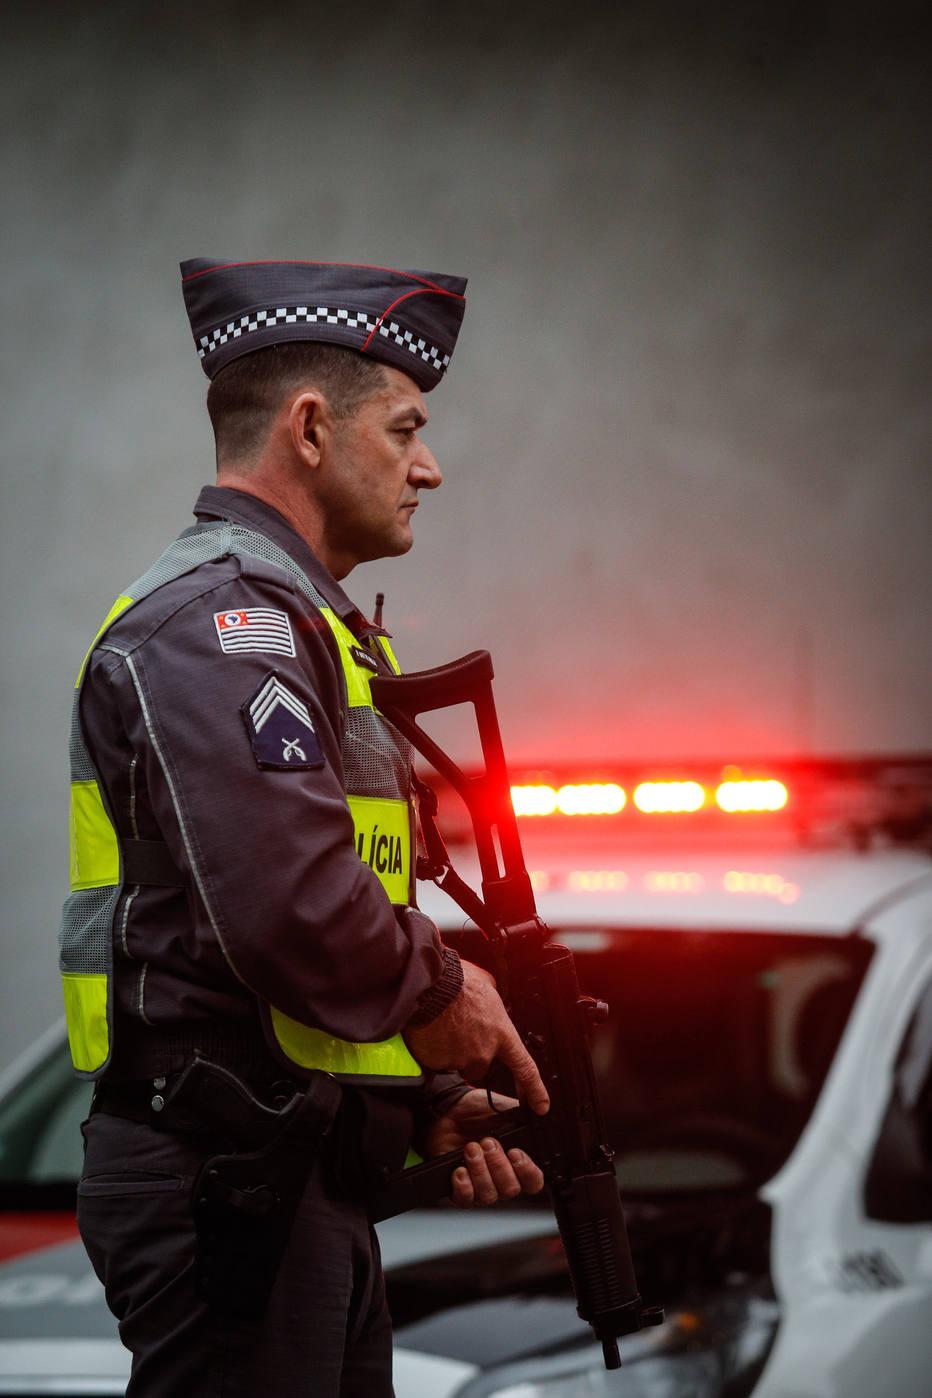 Sargento Alan Mauro